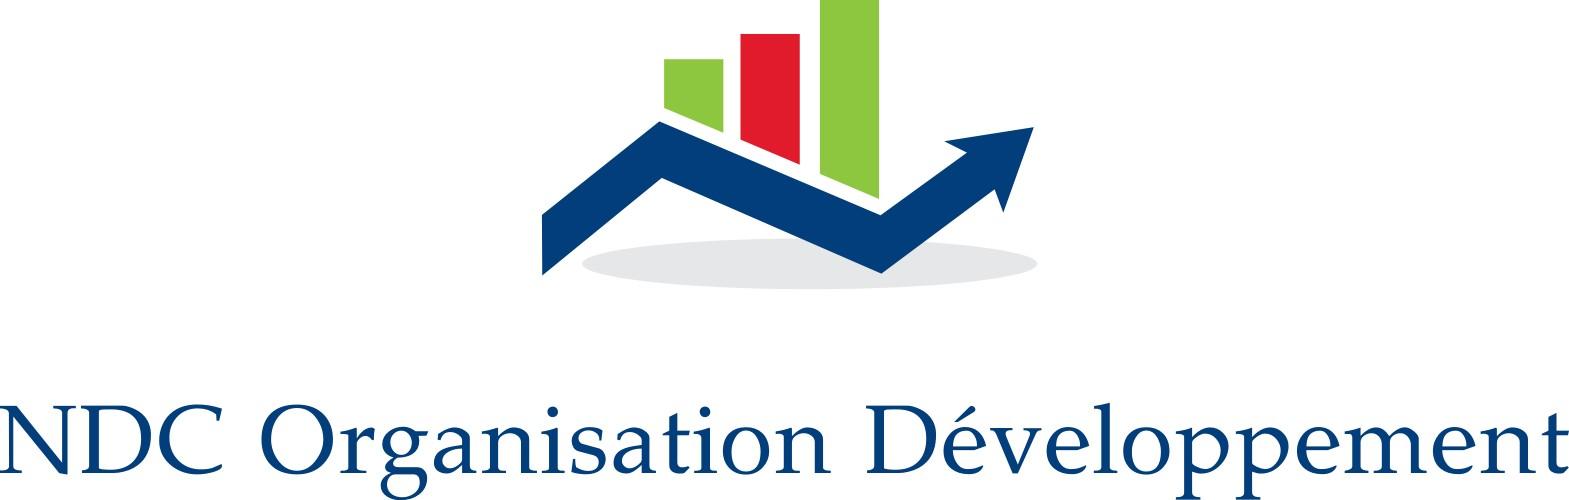 NDC Organisation et Développement | LinkedIn